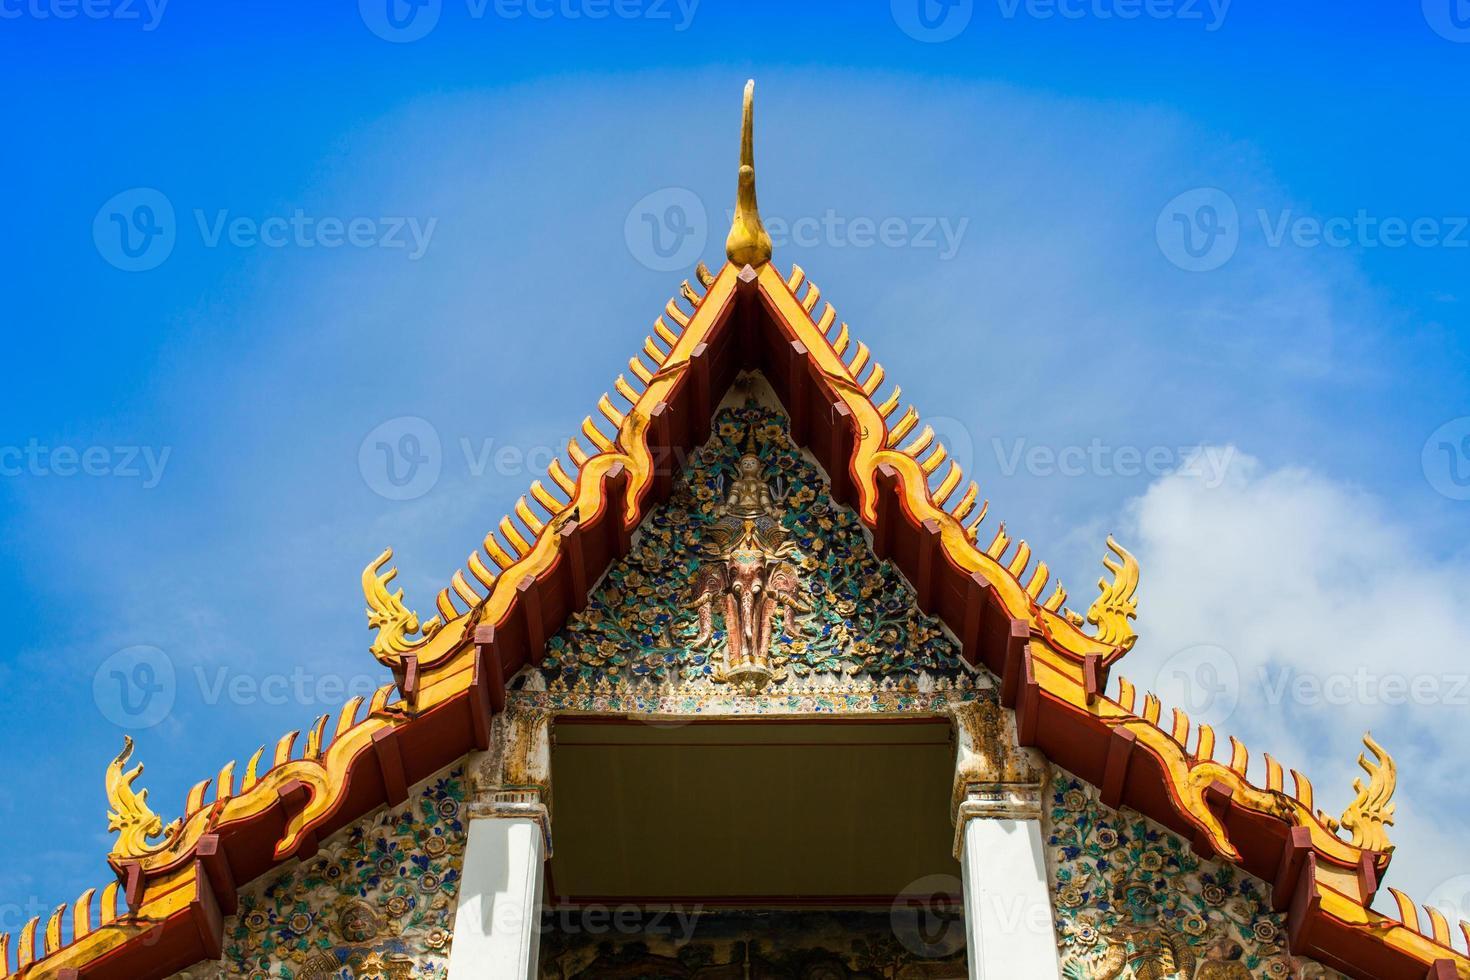 chachoengsao, thailandia, 2020 - intricate opere d'arte sul tempio di wat hong thong foto